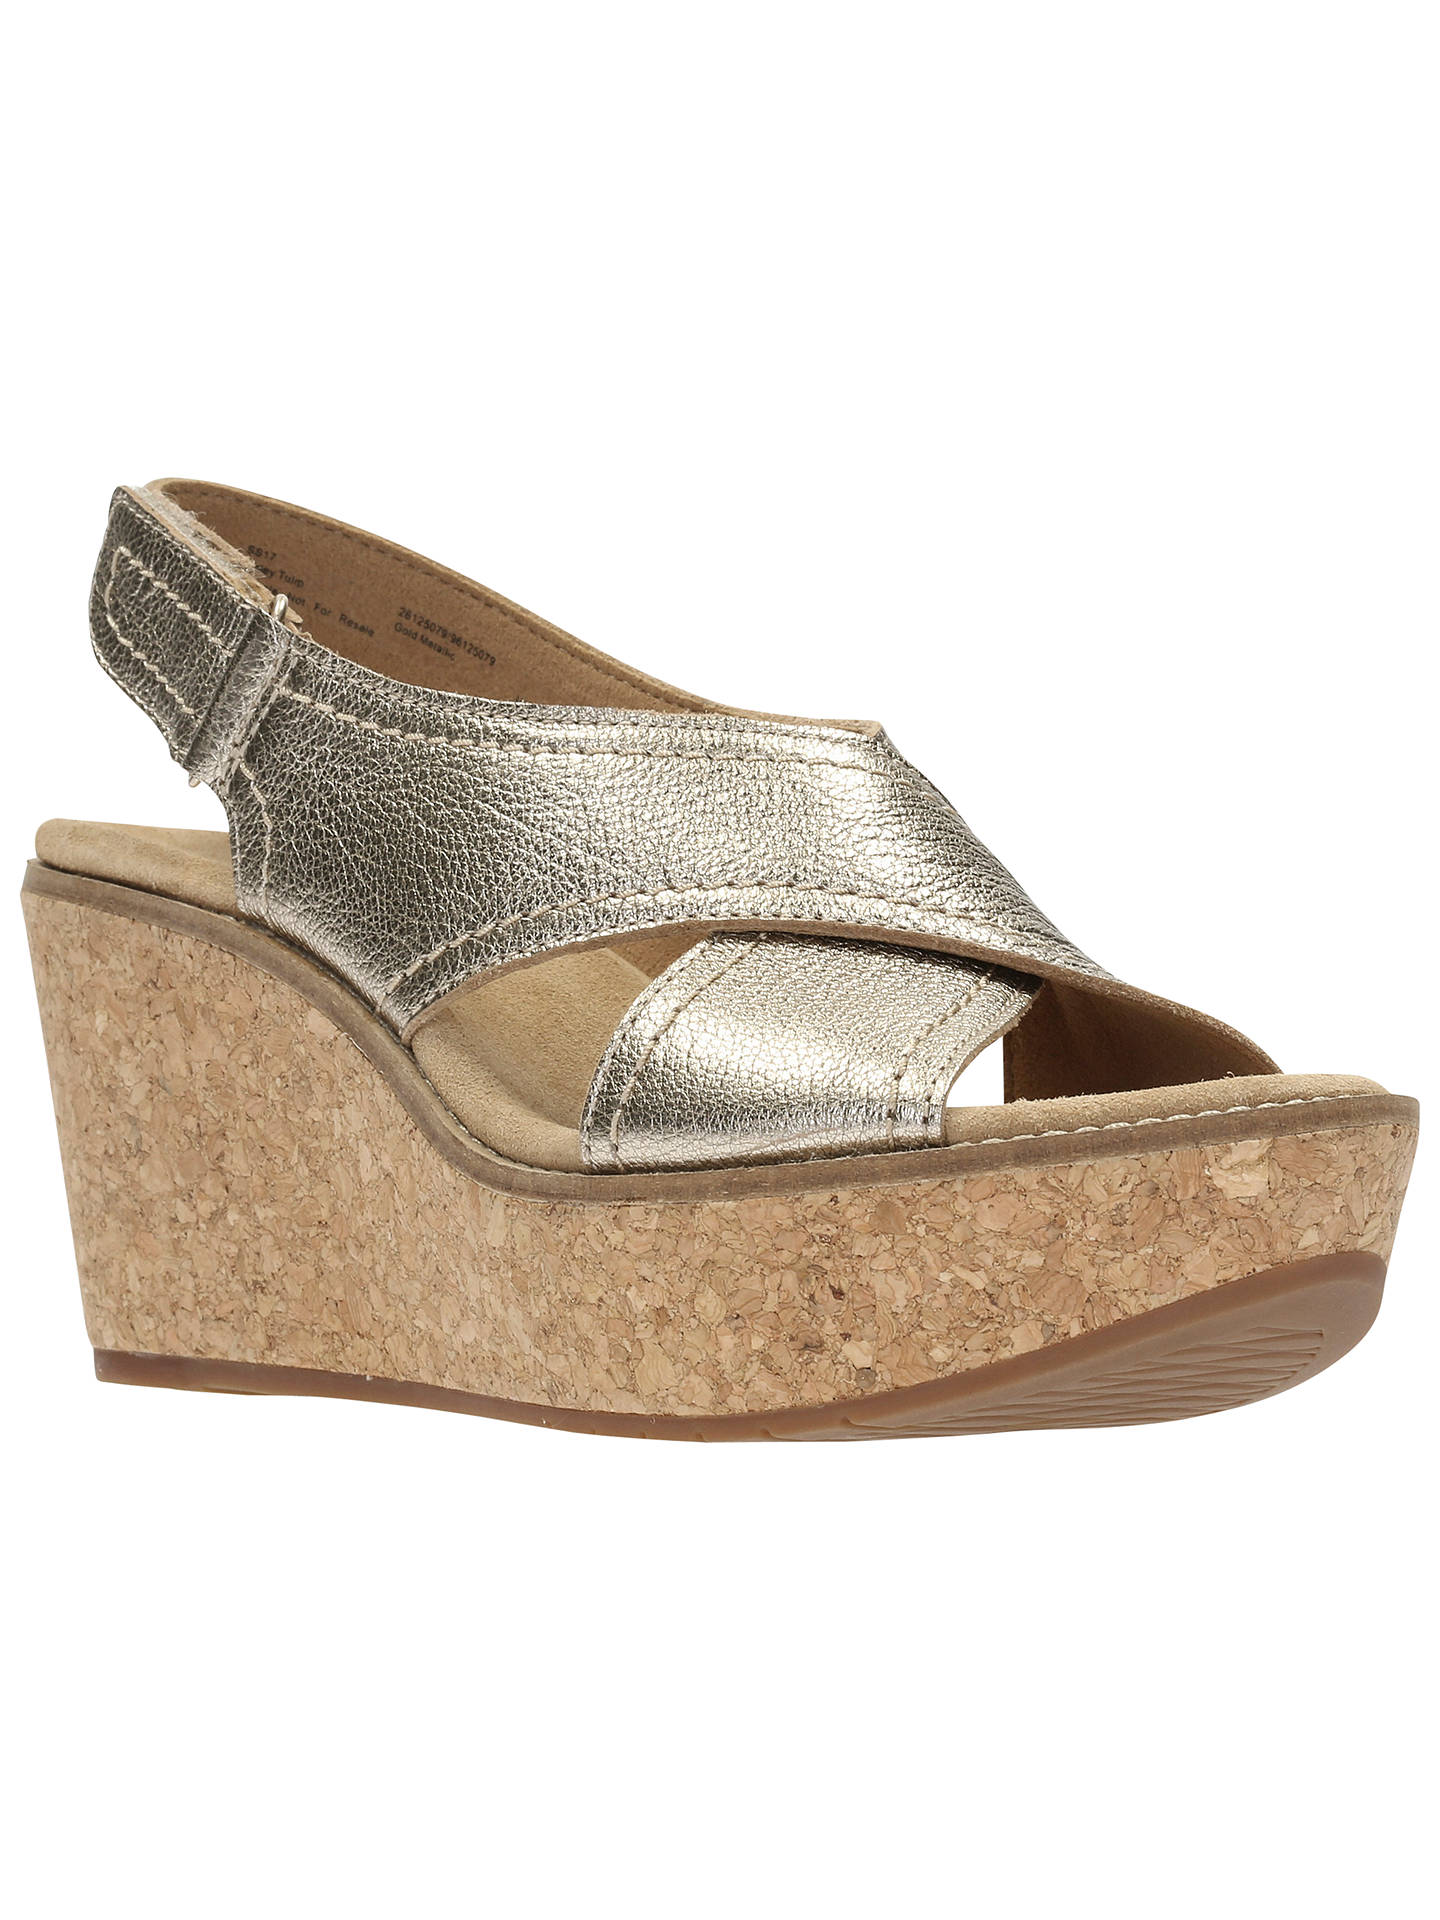 31860d4ad54 Buy Clarks Aisley Tulip Wedge Heeled Sandals